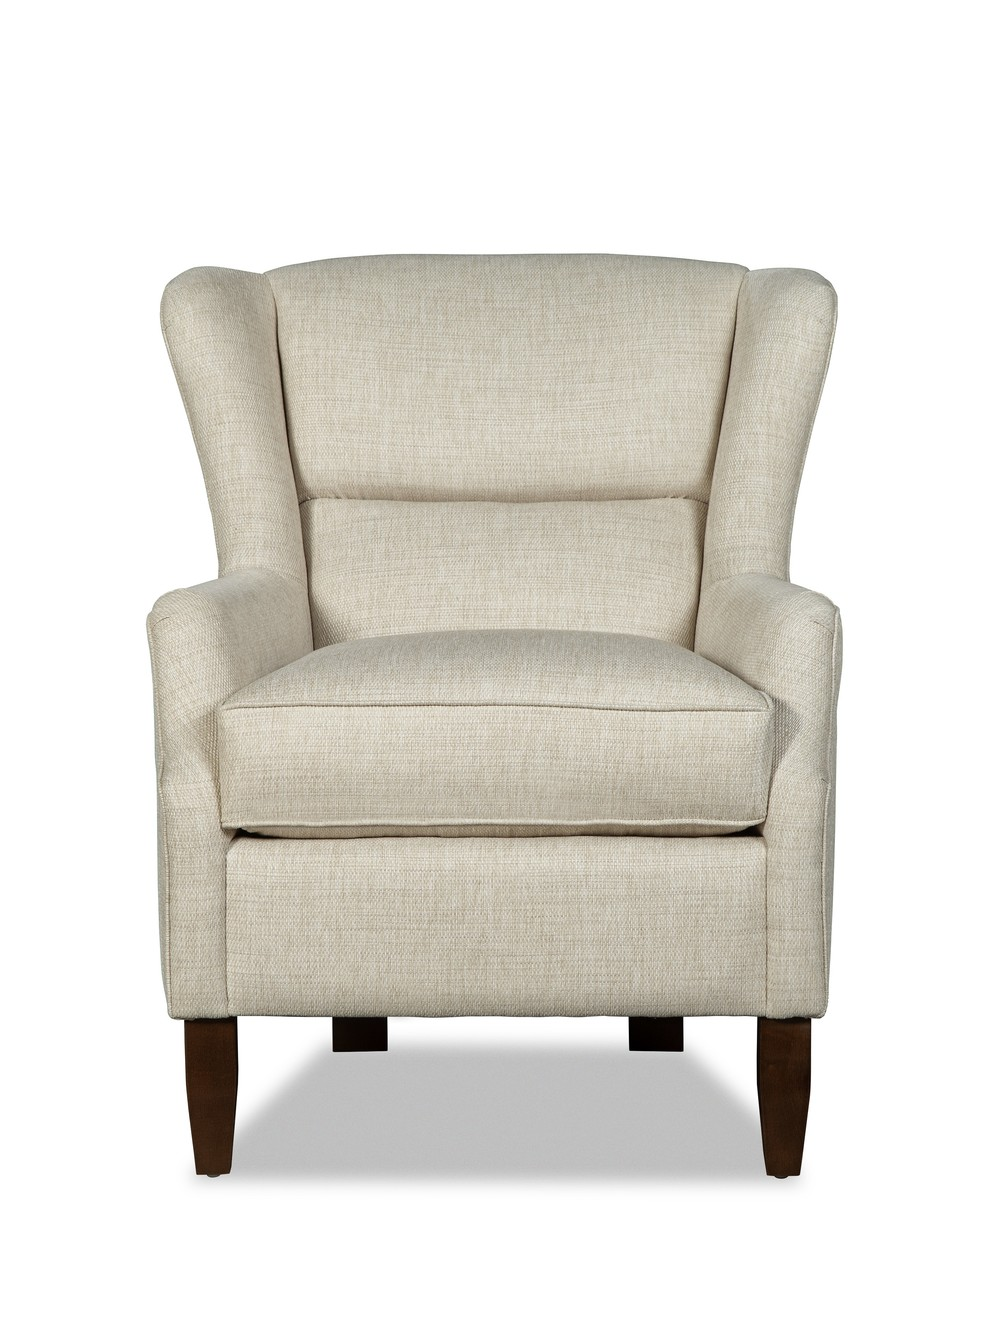 Craftmaster Furniture - Chair